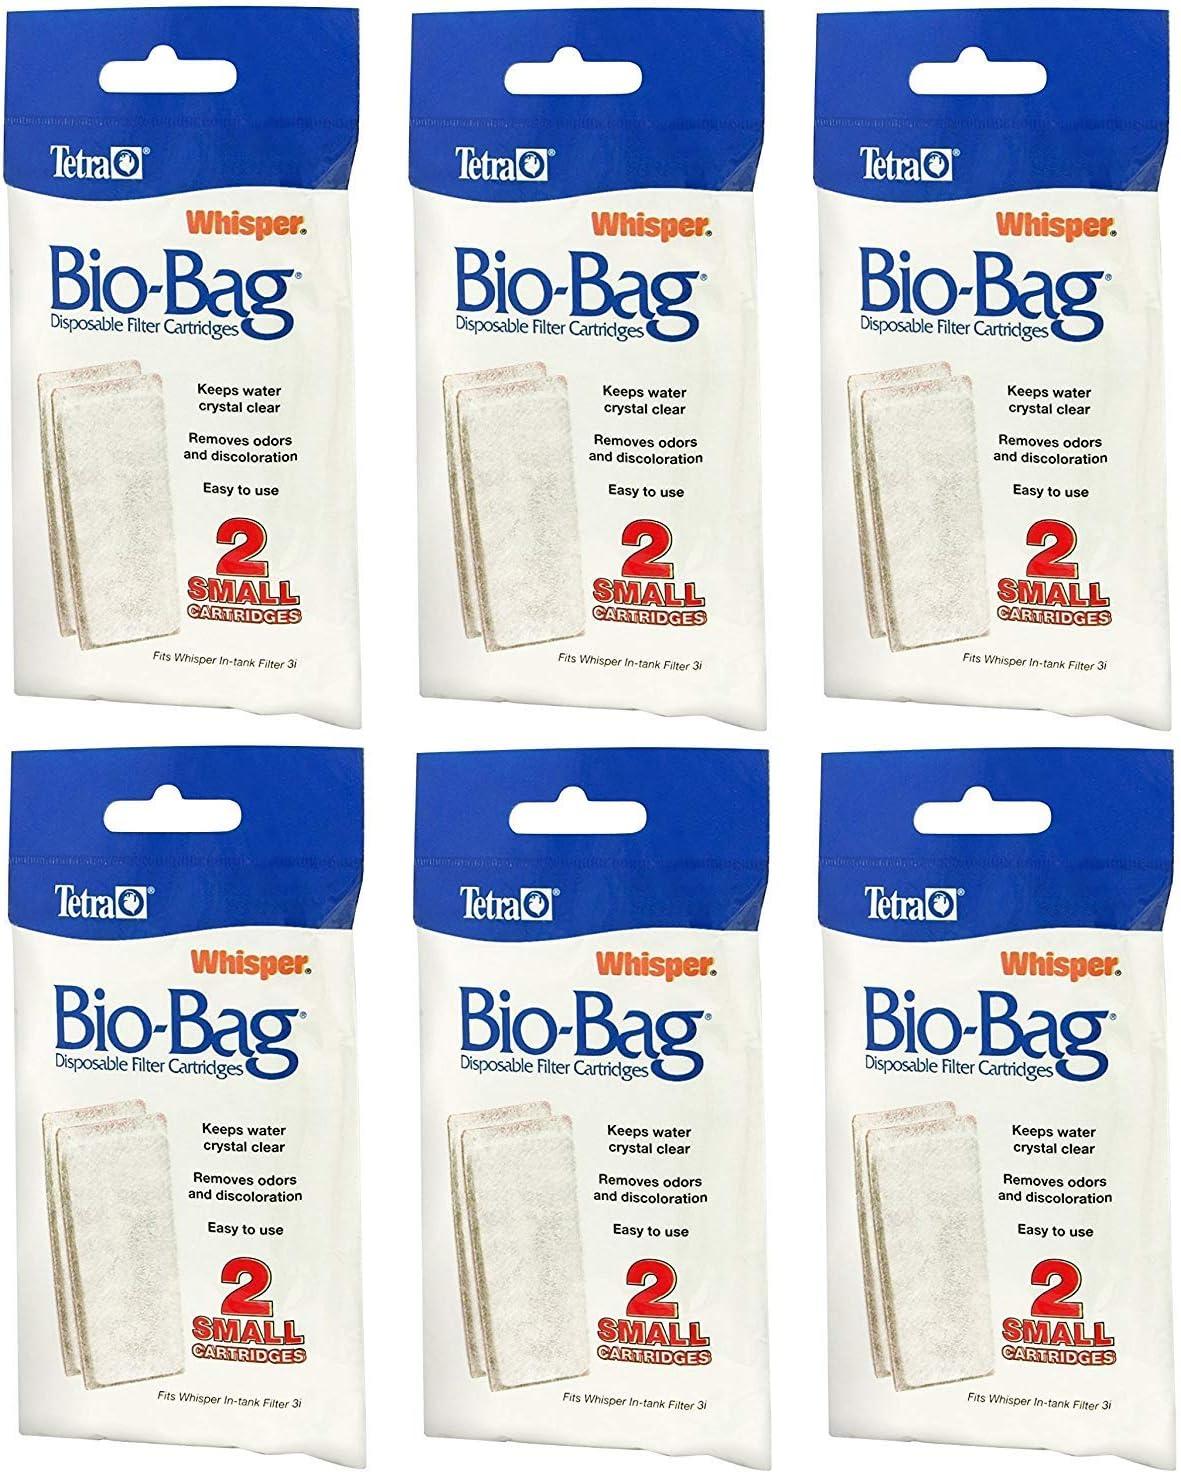 Tetra Whisper Assembled Bio-Bag Filter Cartridges Small 4-Count by Tetra